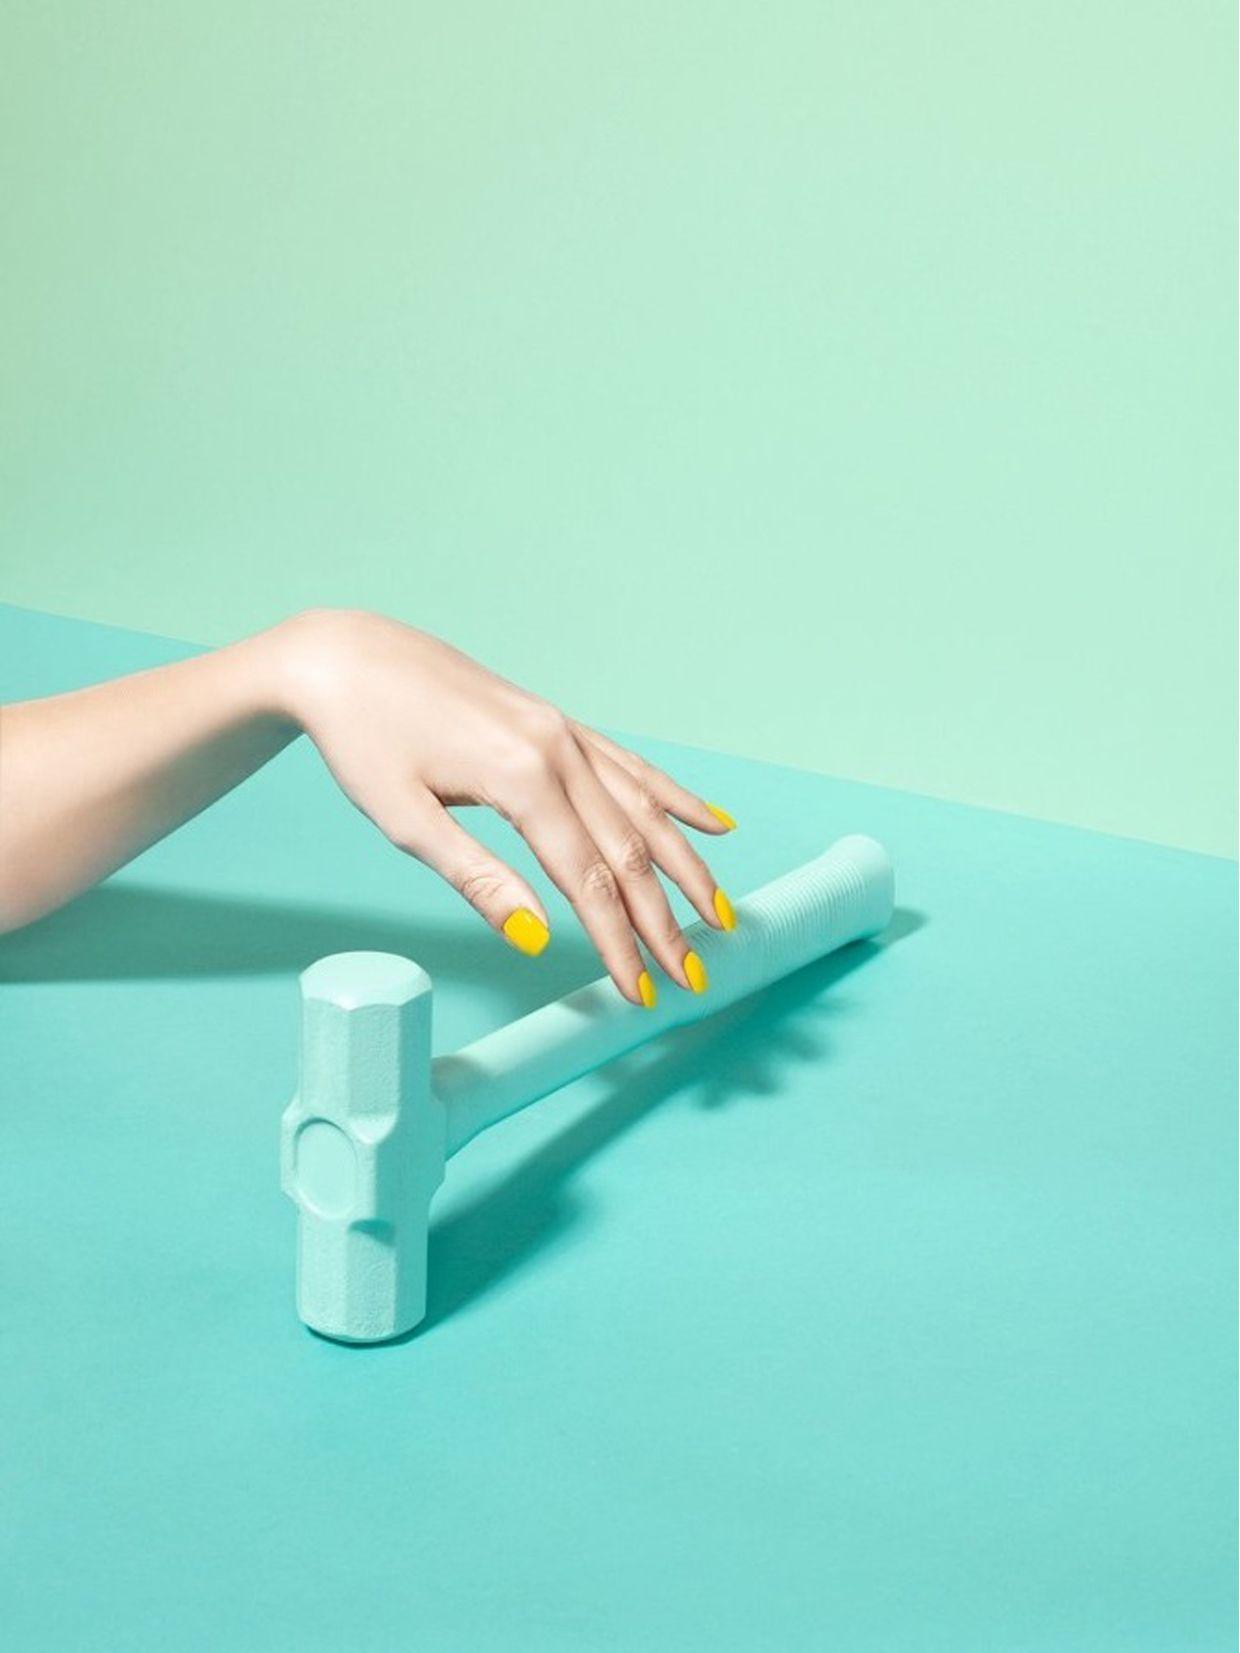 ♡ Art Direction : green mint hammer | Styled | Pinterest | Pastels ...